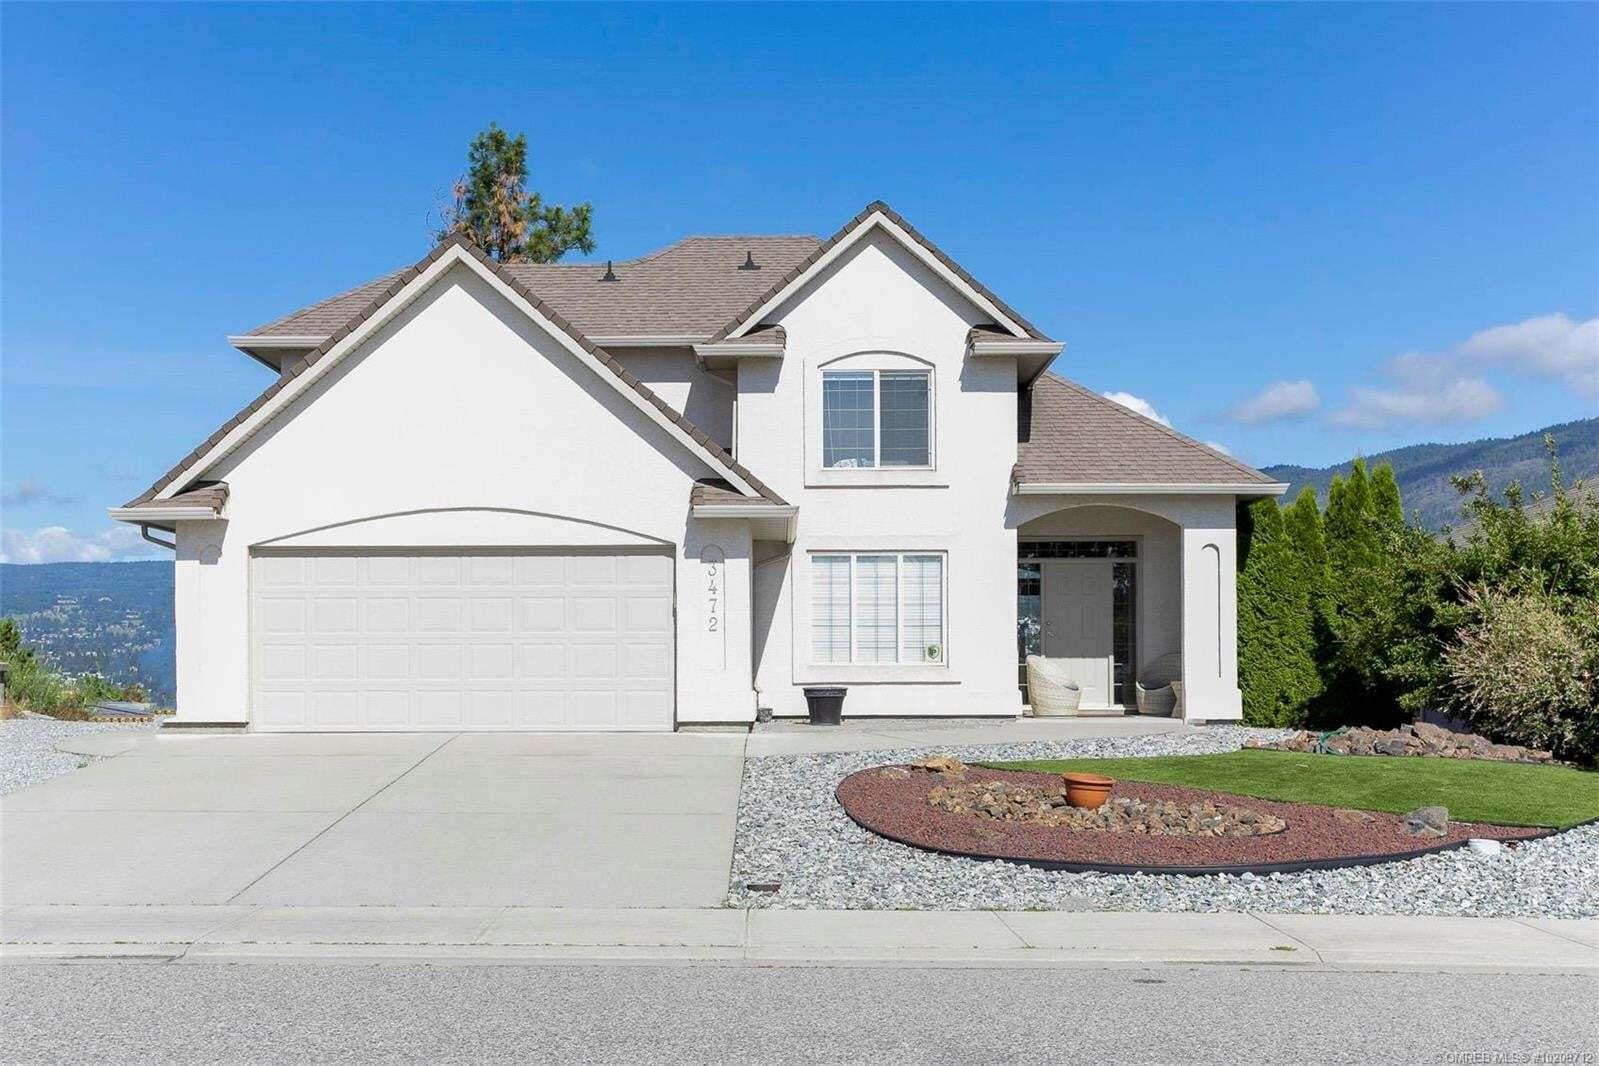 House for sale at 3472 Ridge Blvd West Kelowna British Columbia - MLS: 10209712